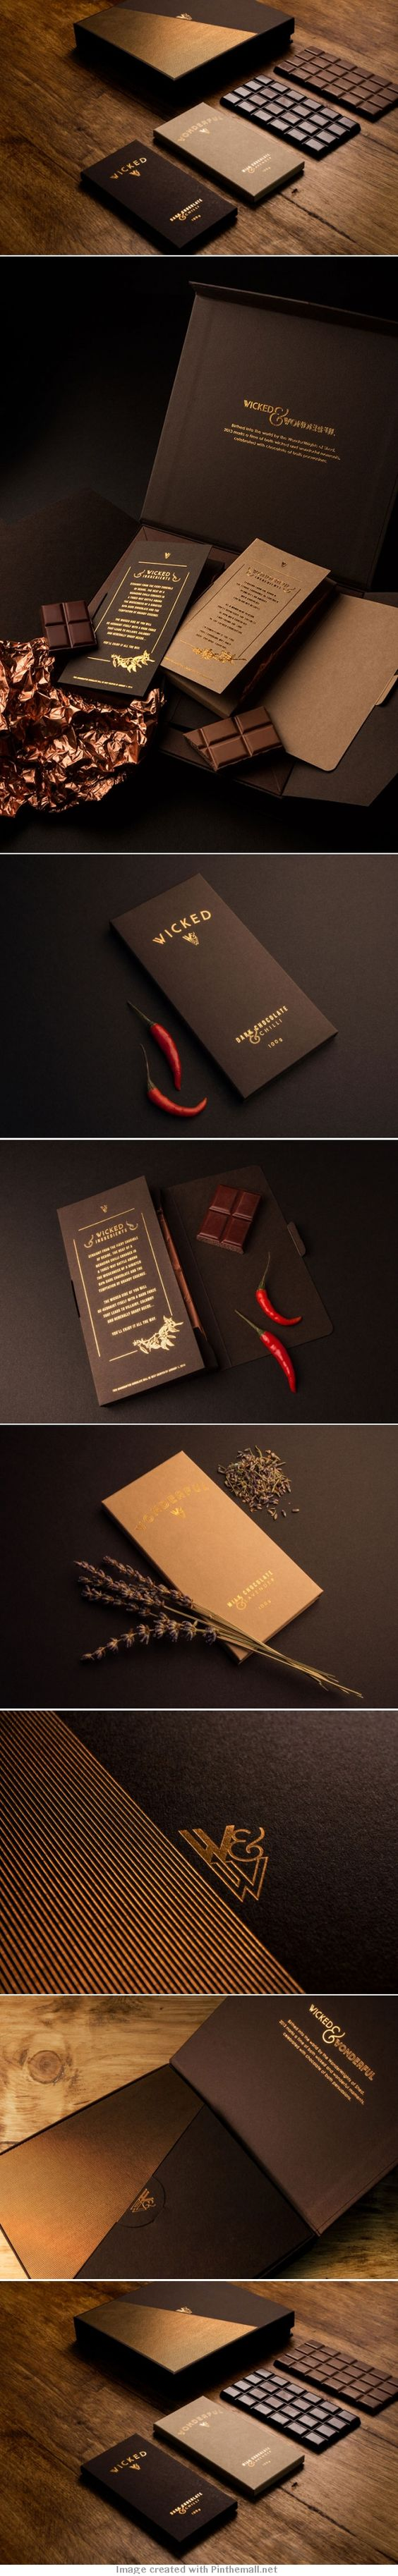 Packaging cioccolato esclusivo